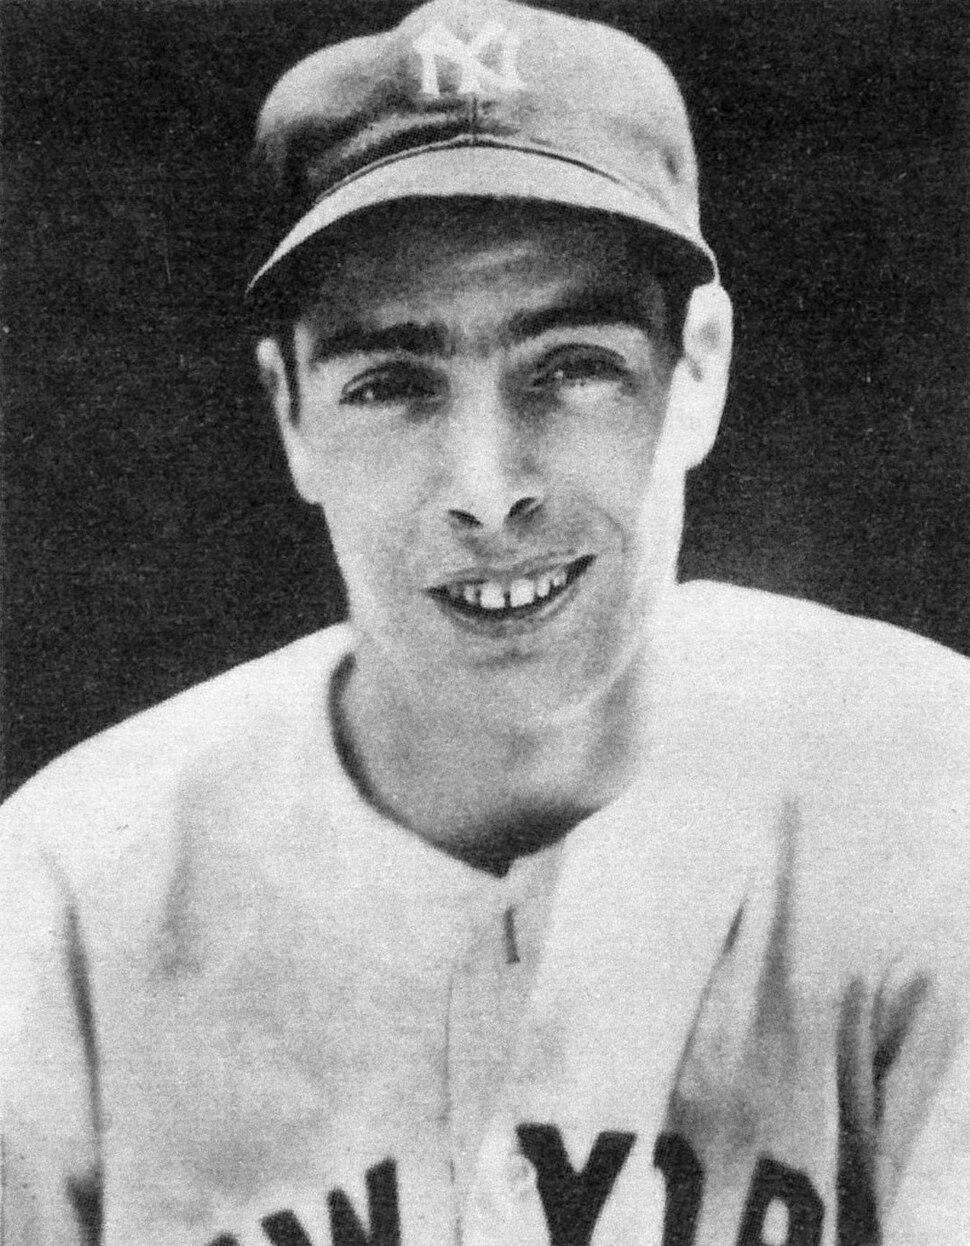 1939 Playball Joe Dimaggio (minus halftone)